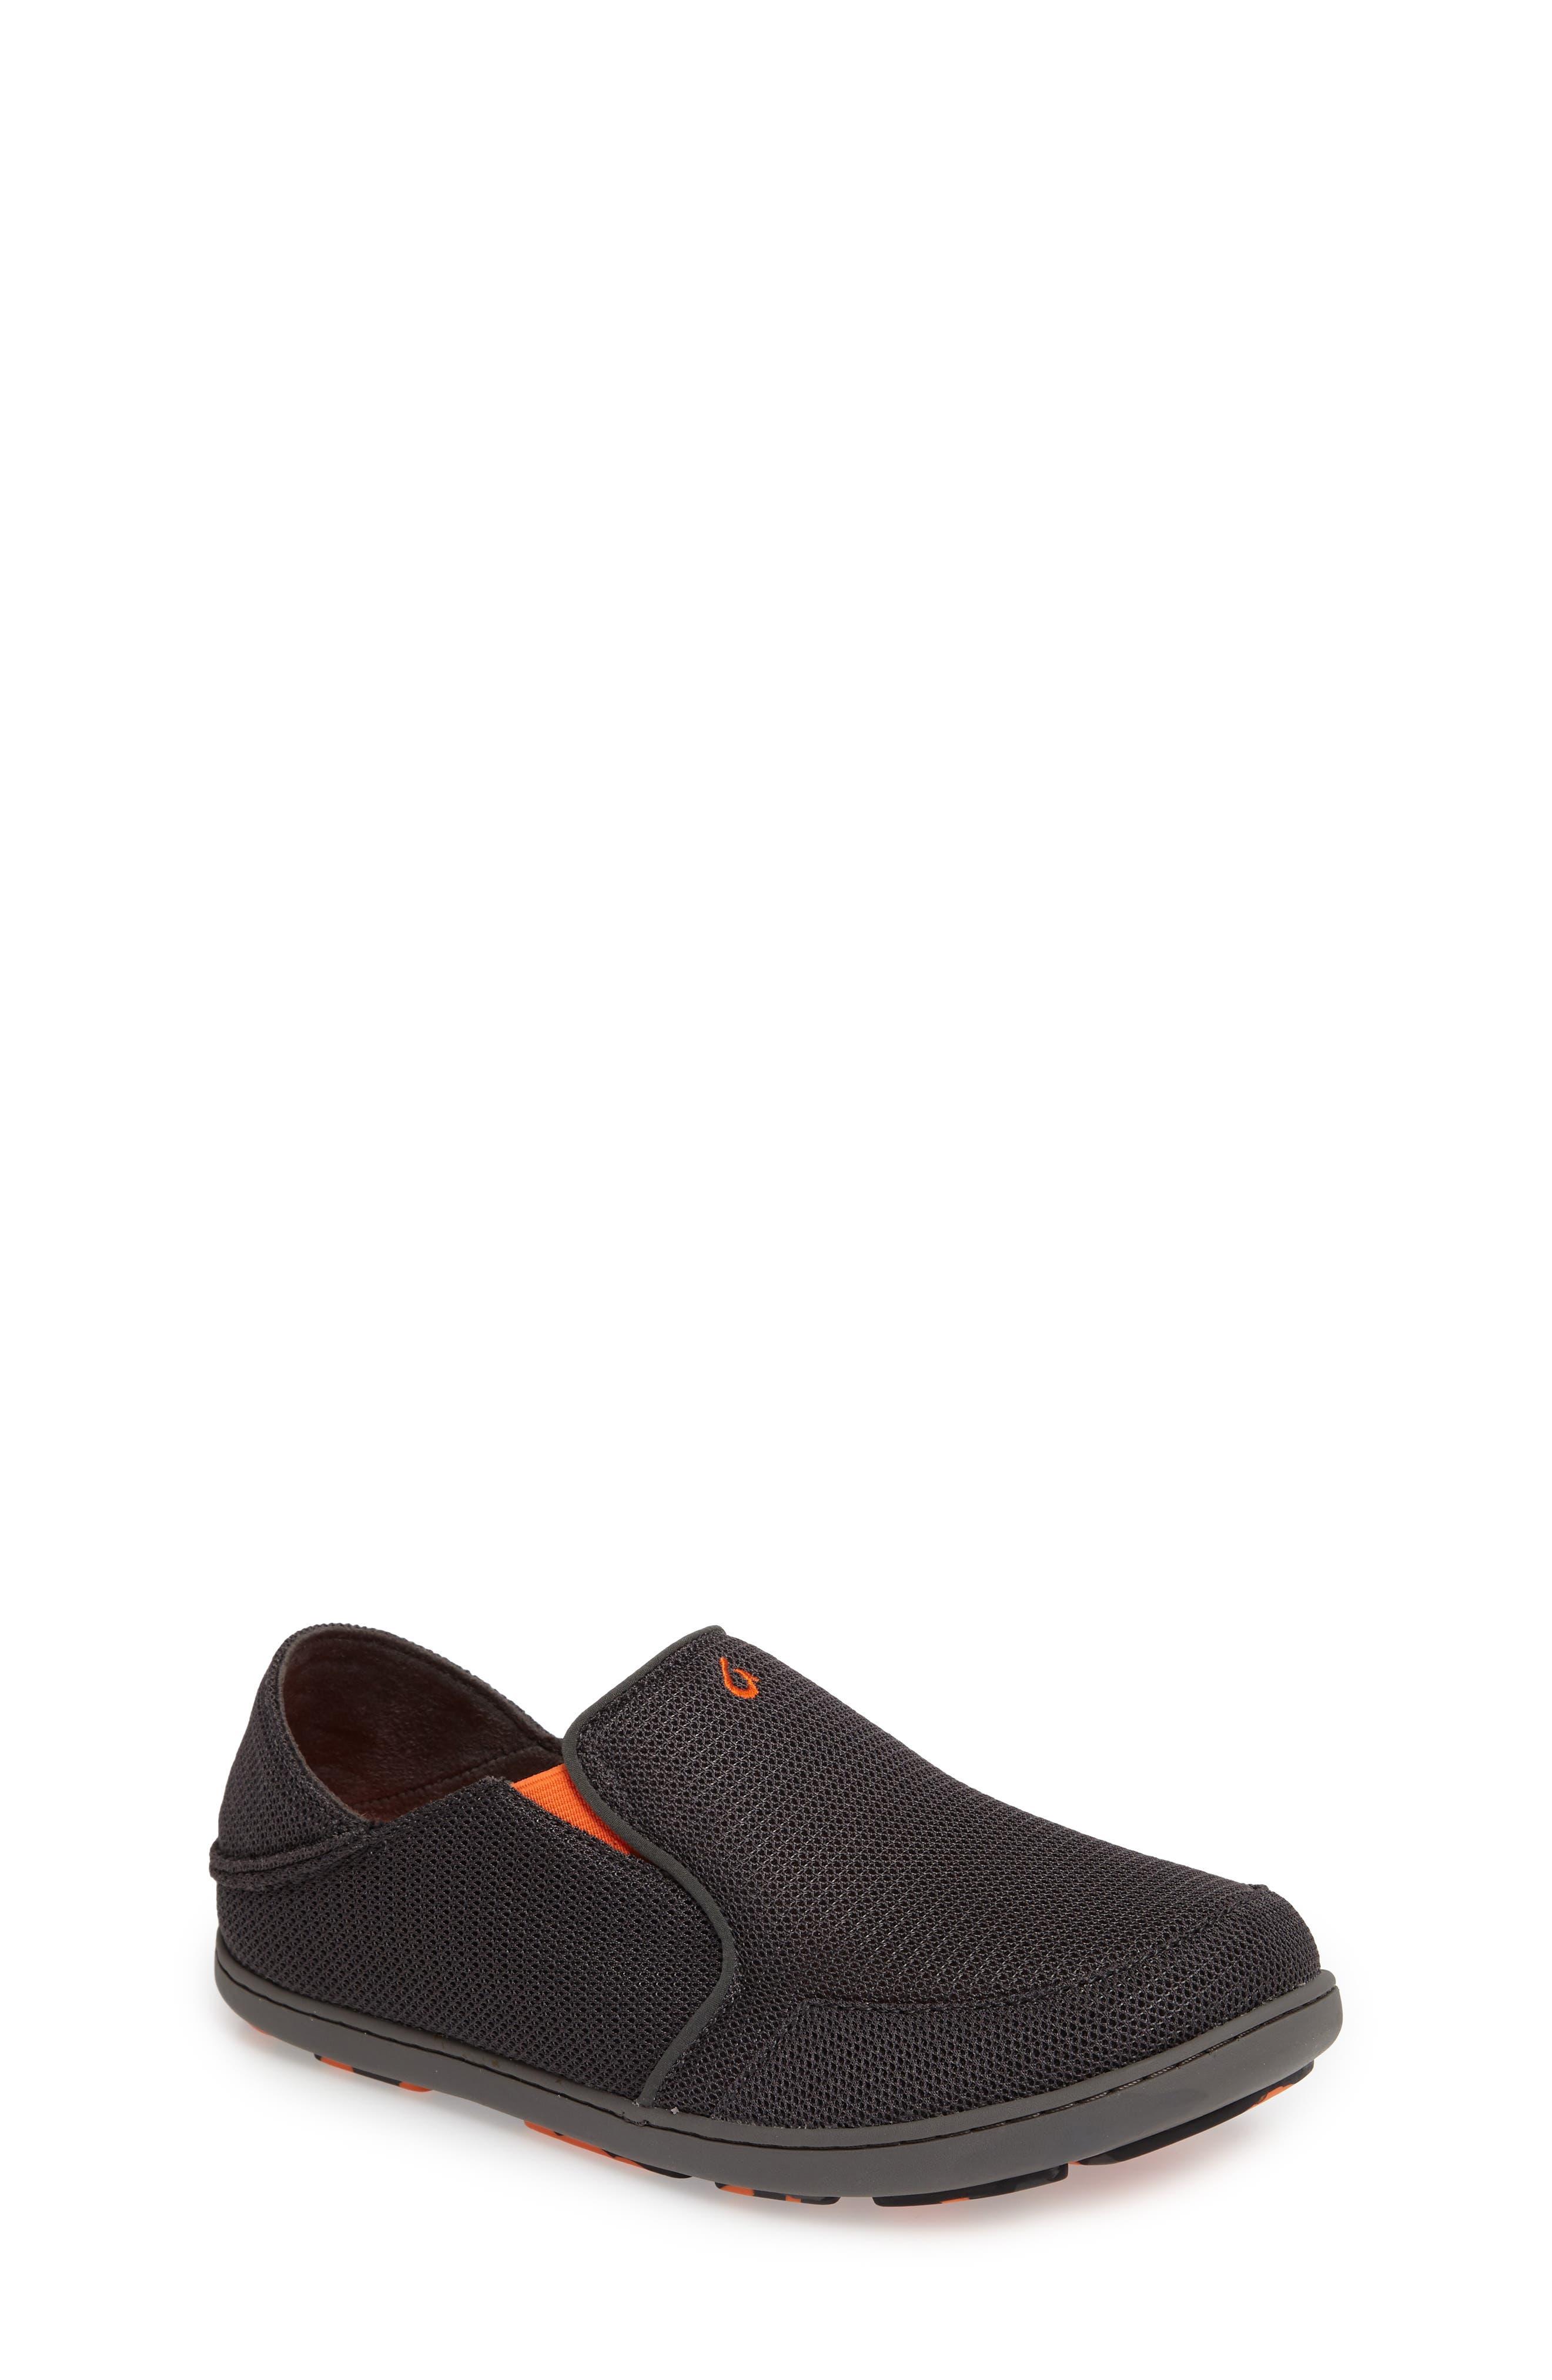 OLUKAI 'Nohea' Mesh Shoe, Main, color, DARK SHADOW/ BLAZE